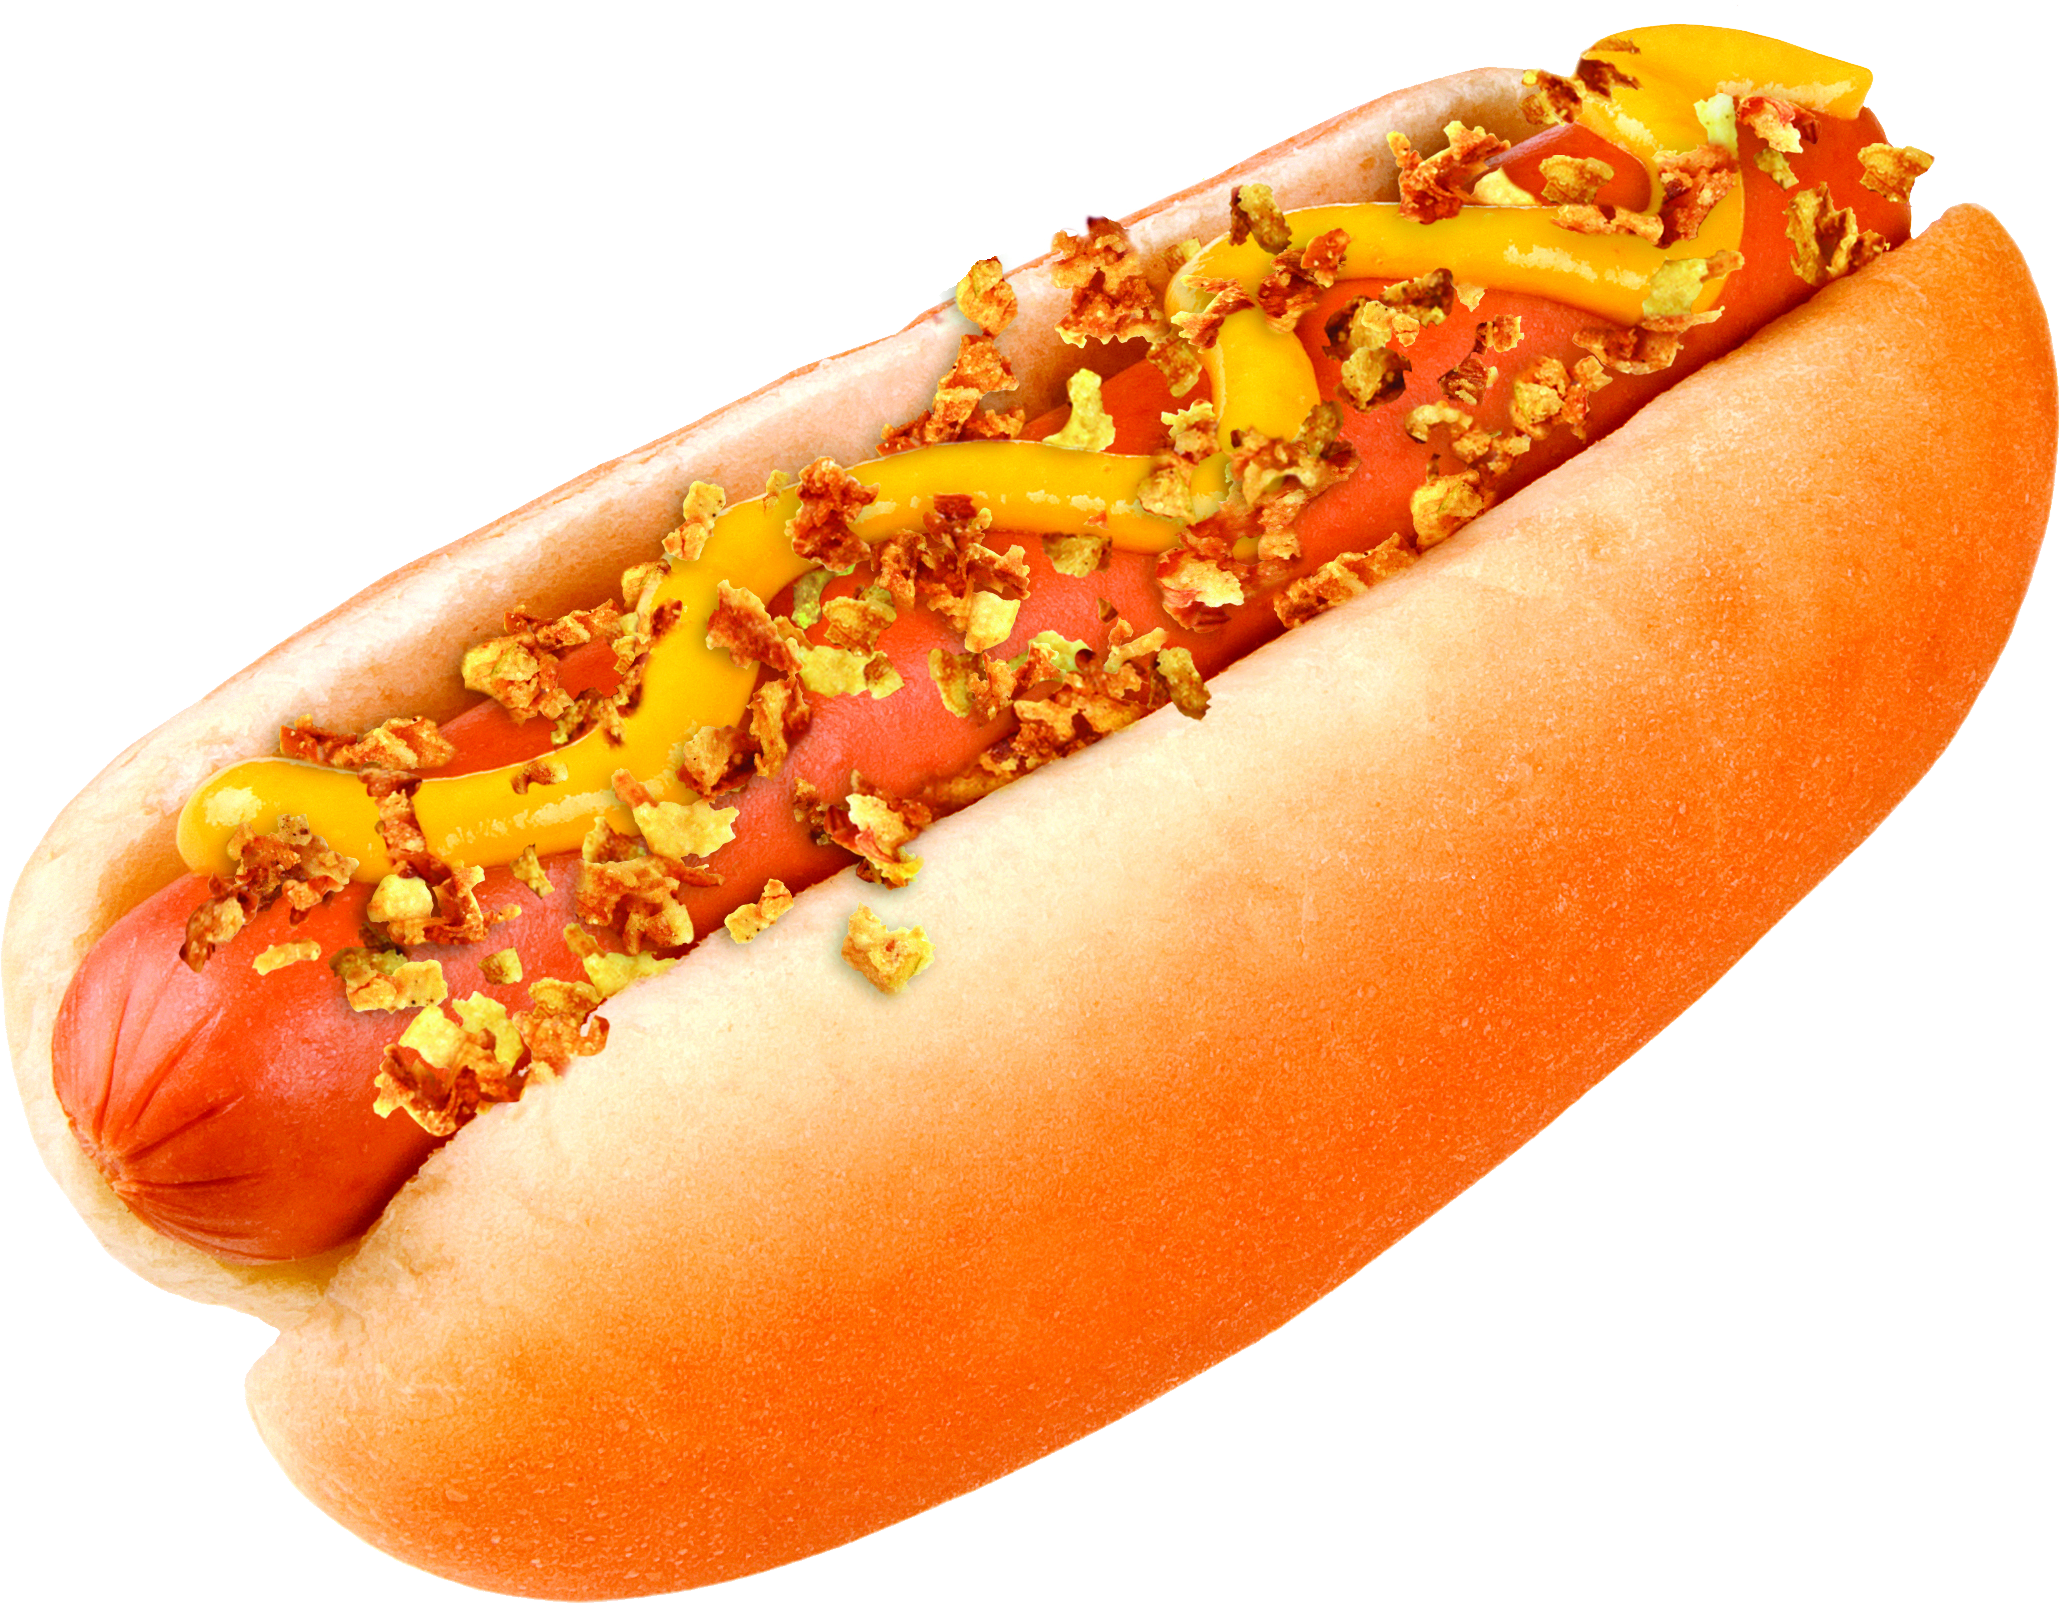 Hot dog PNG images free download.